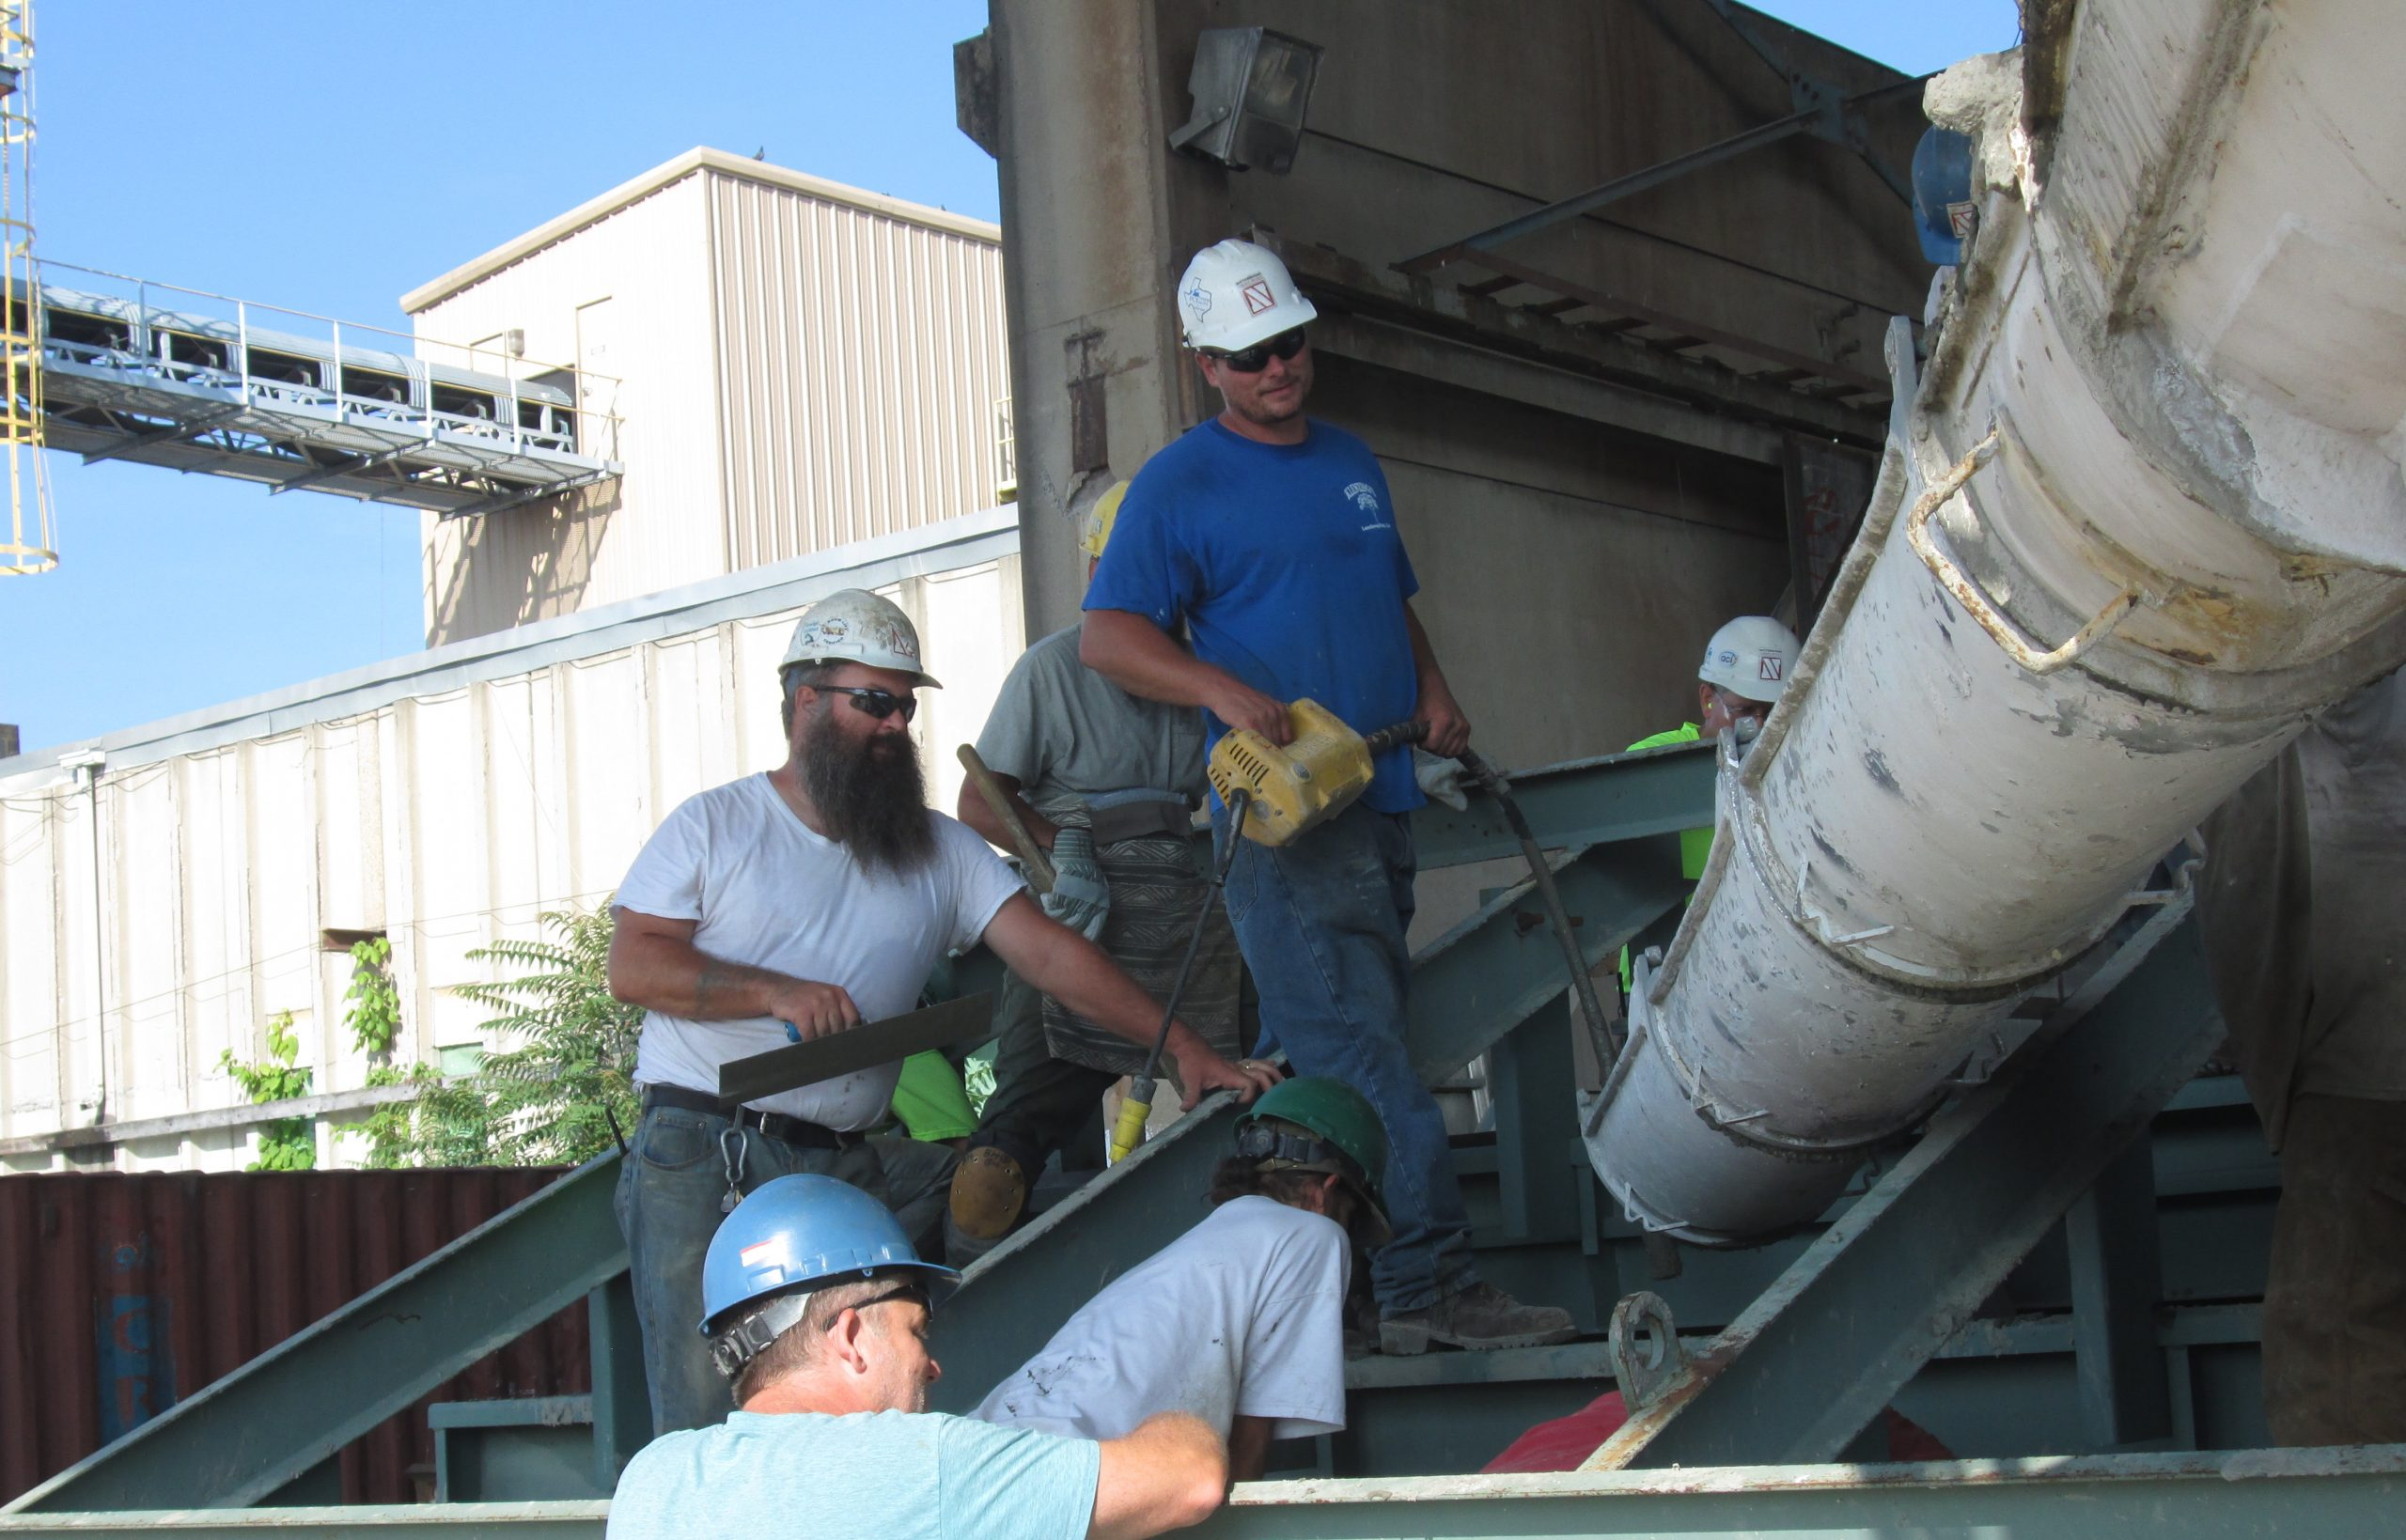 Nitterhouse employees pouring concrete into stadium riser molds